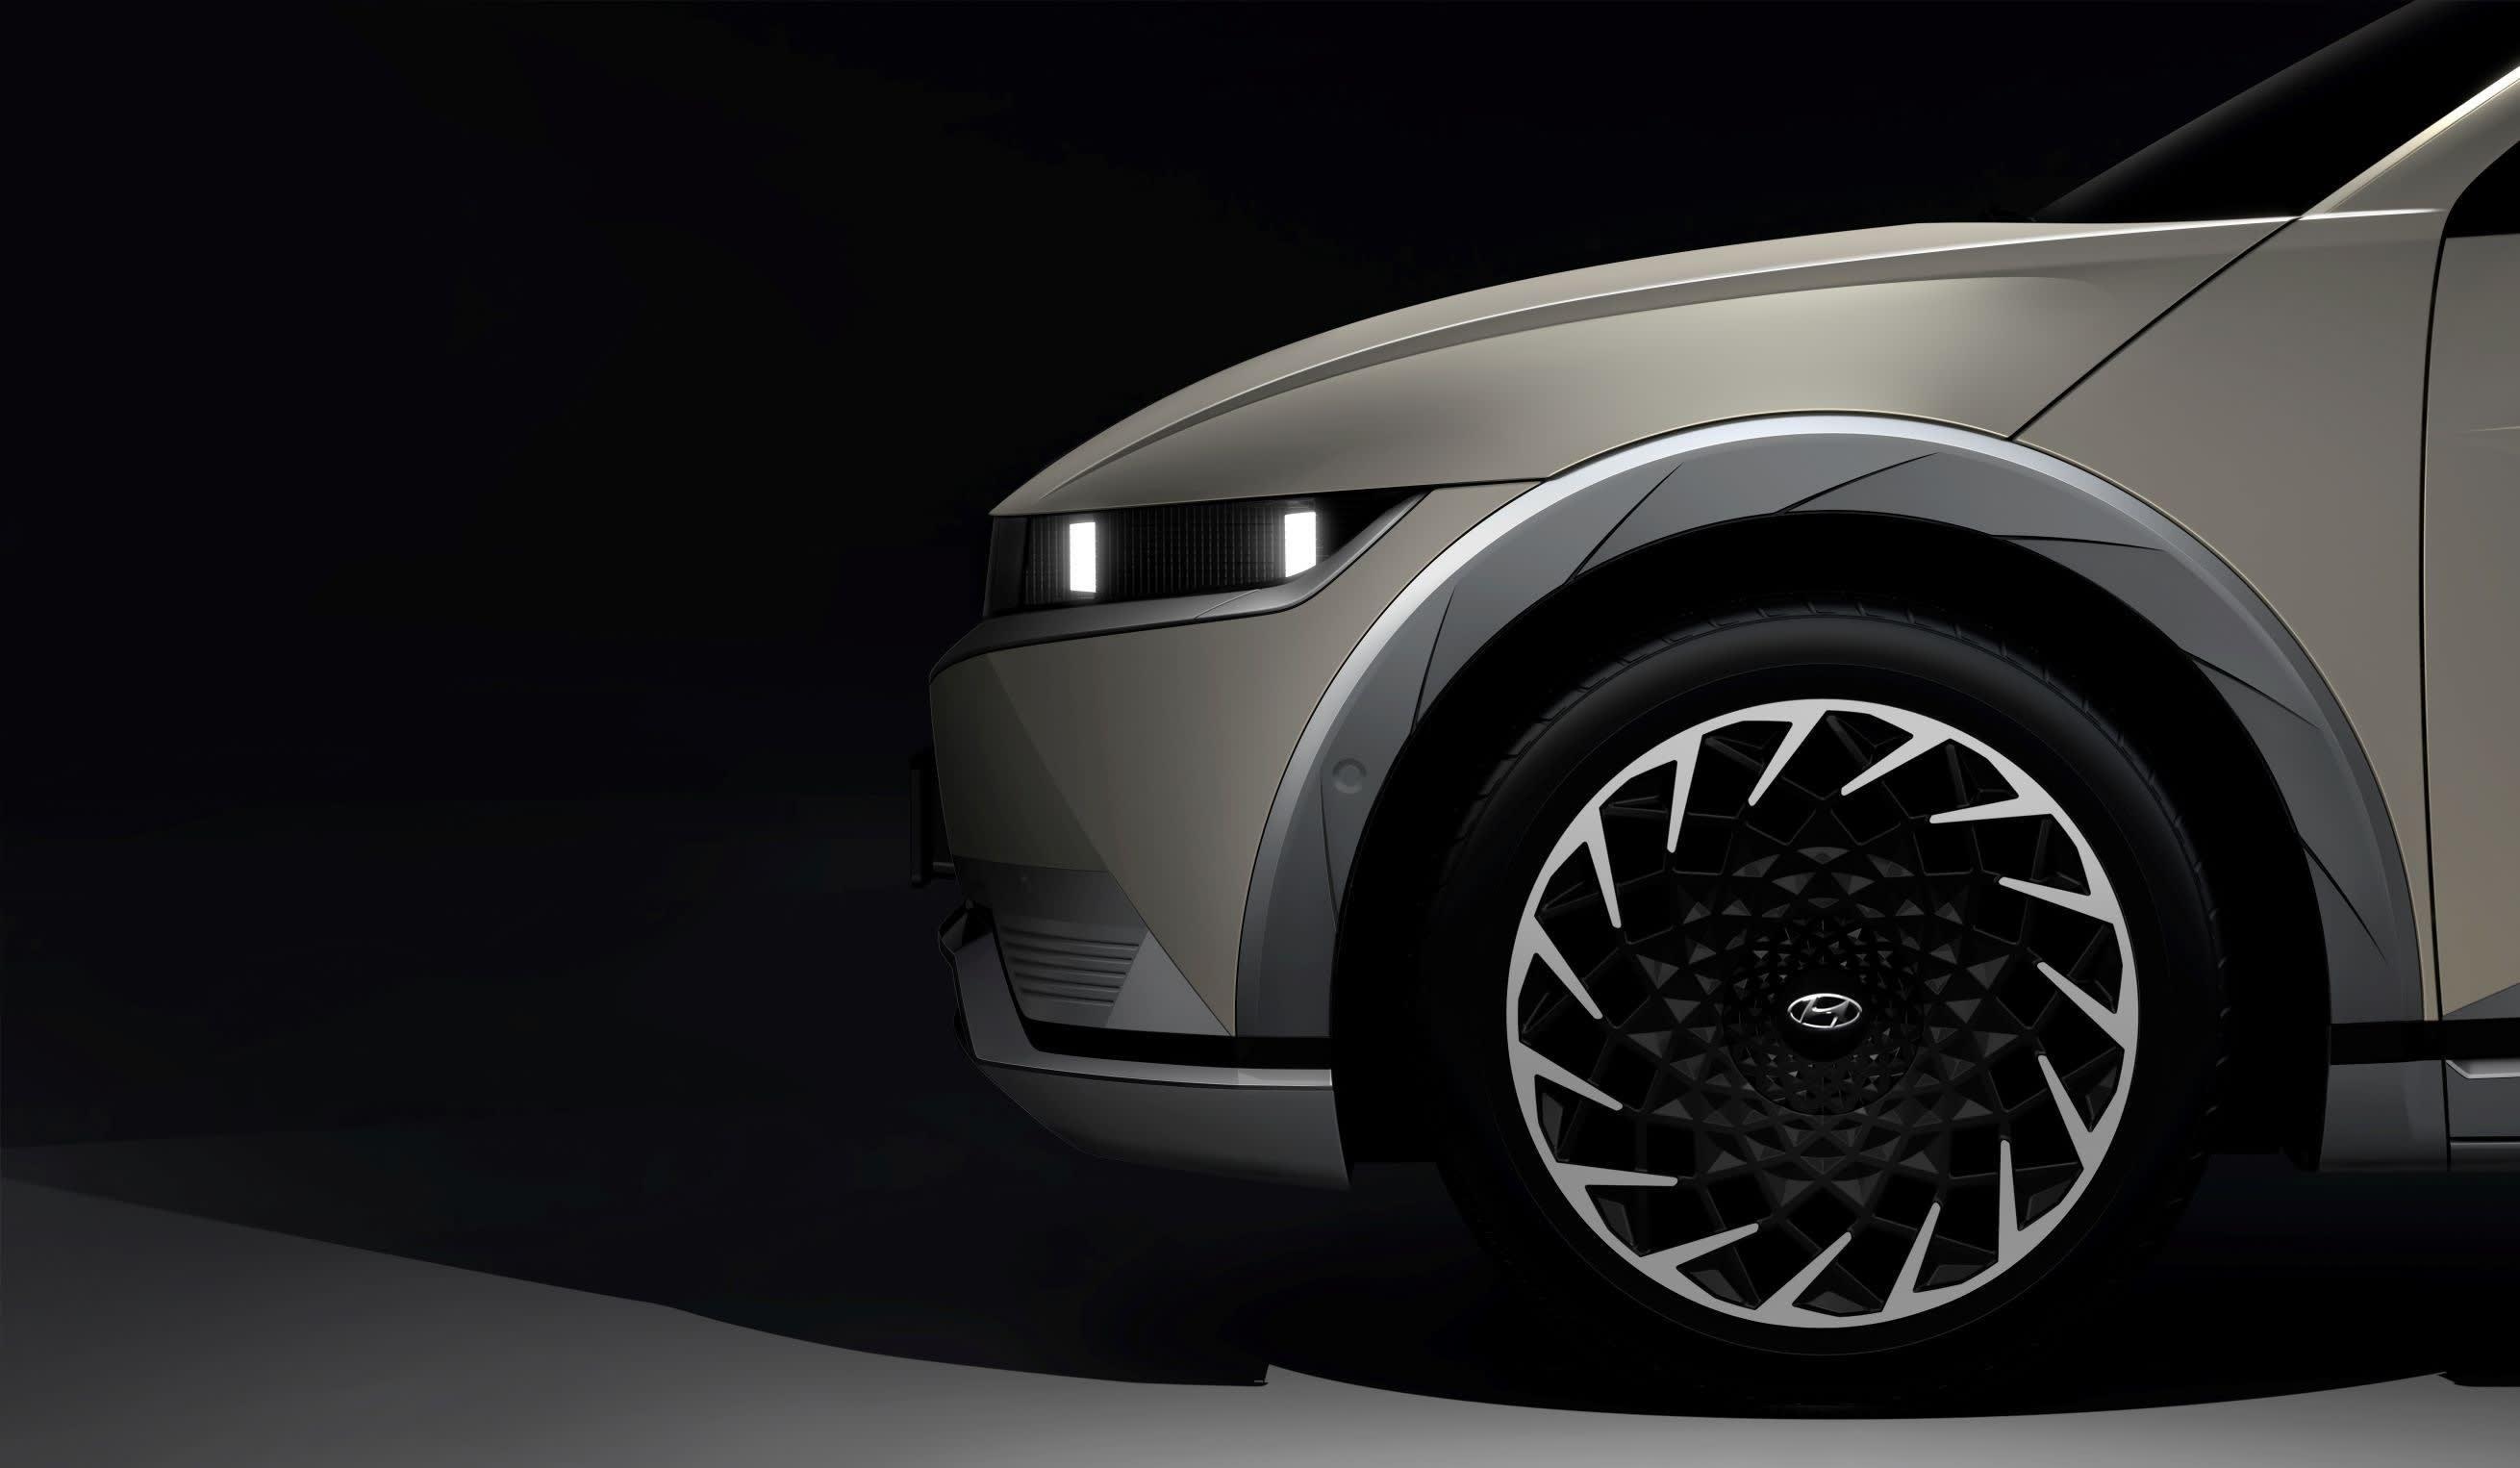 Sliding console of the new electric crossover Hyundai Ioniq 5